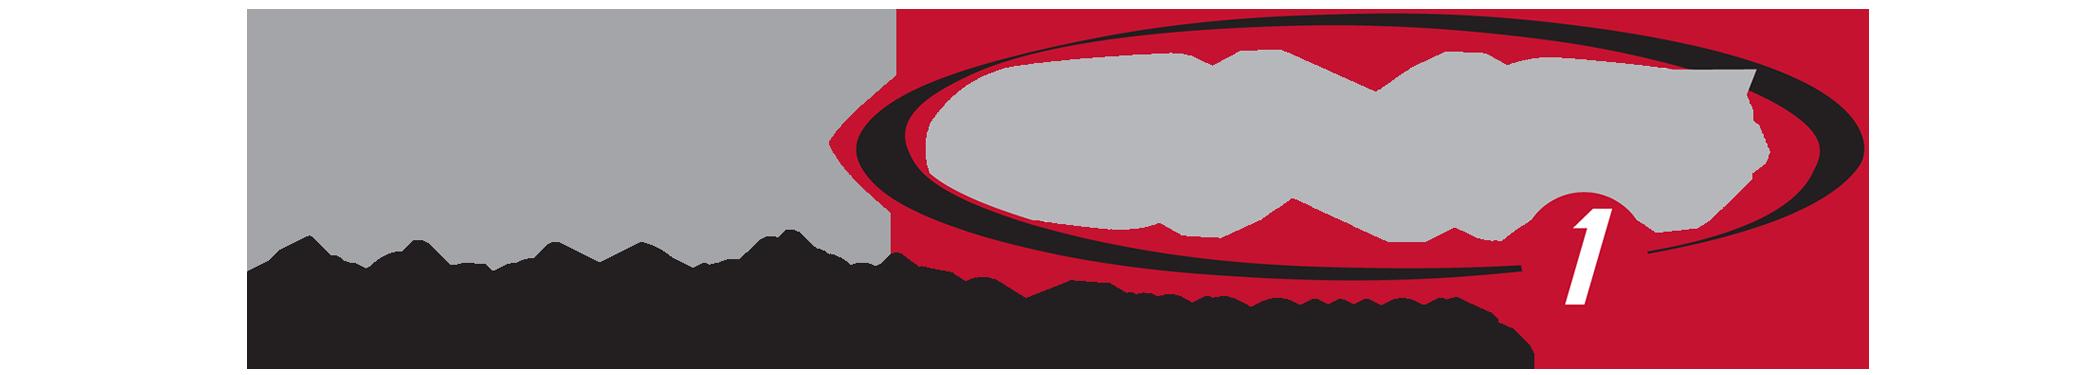 2100 maxone_gray_logo.png